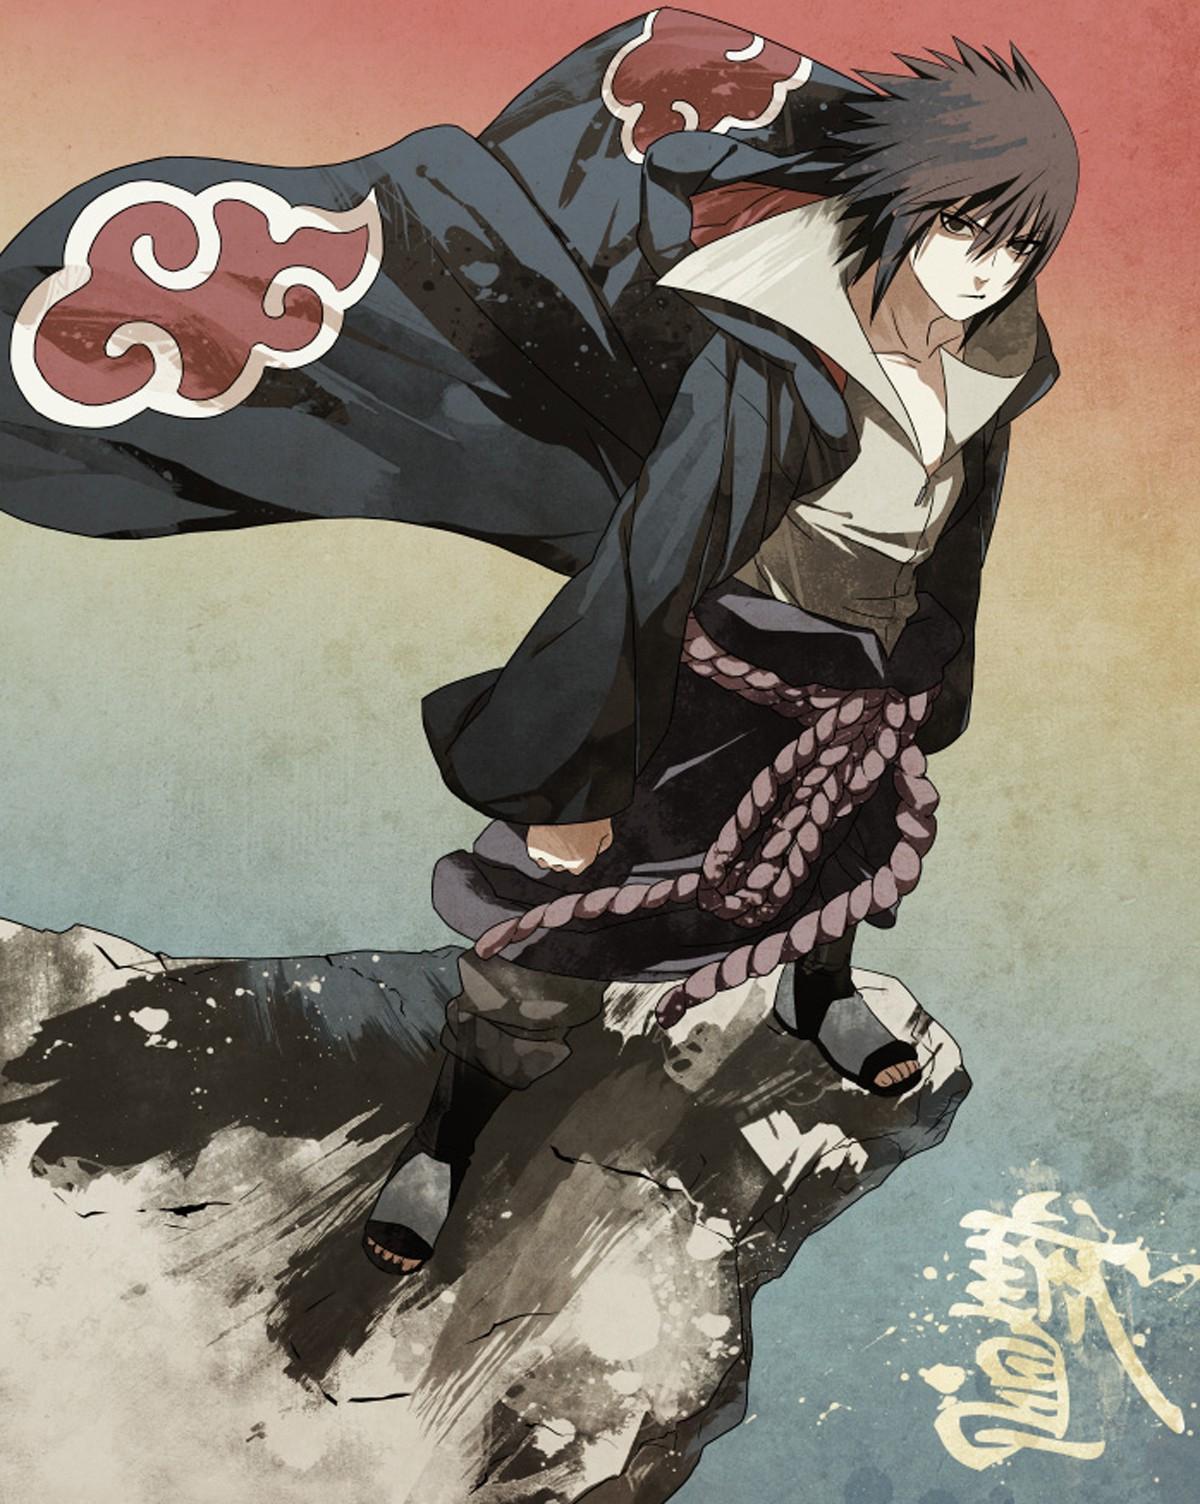 Wallpaper : illustration, anime boys, cliff, Naruto ...